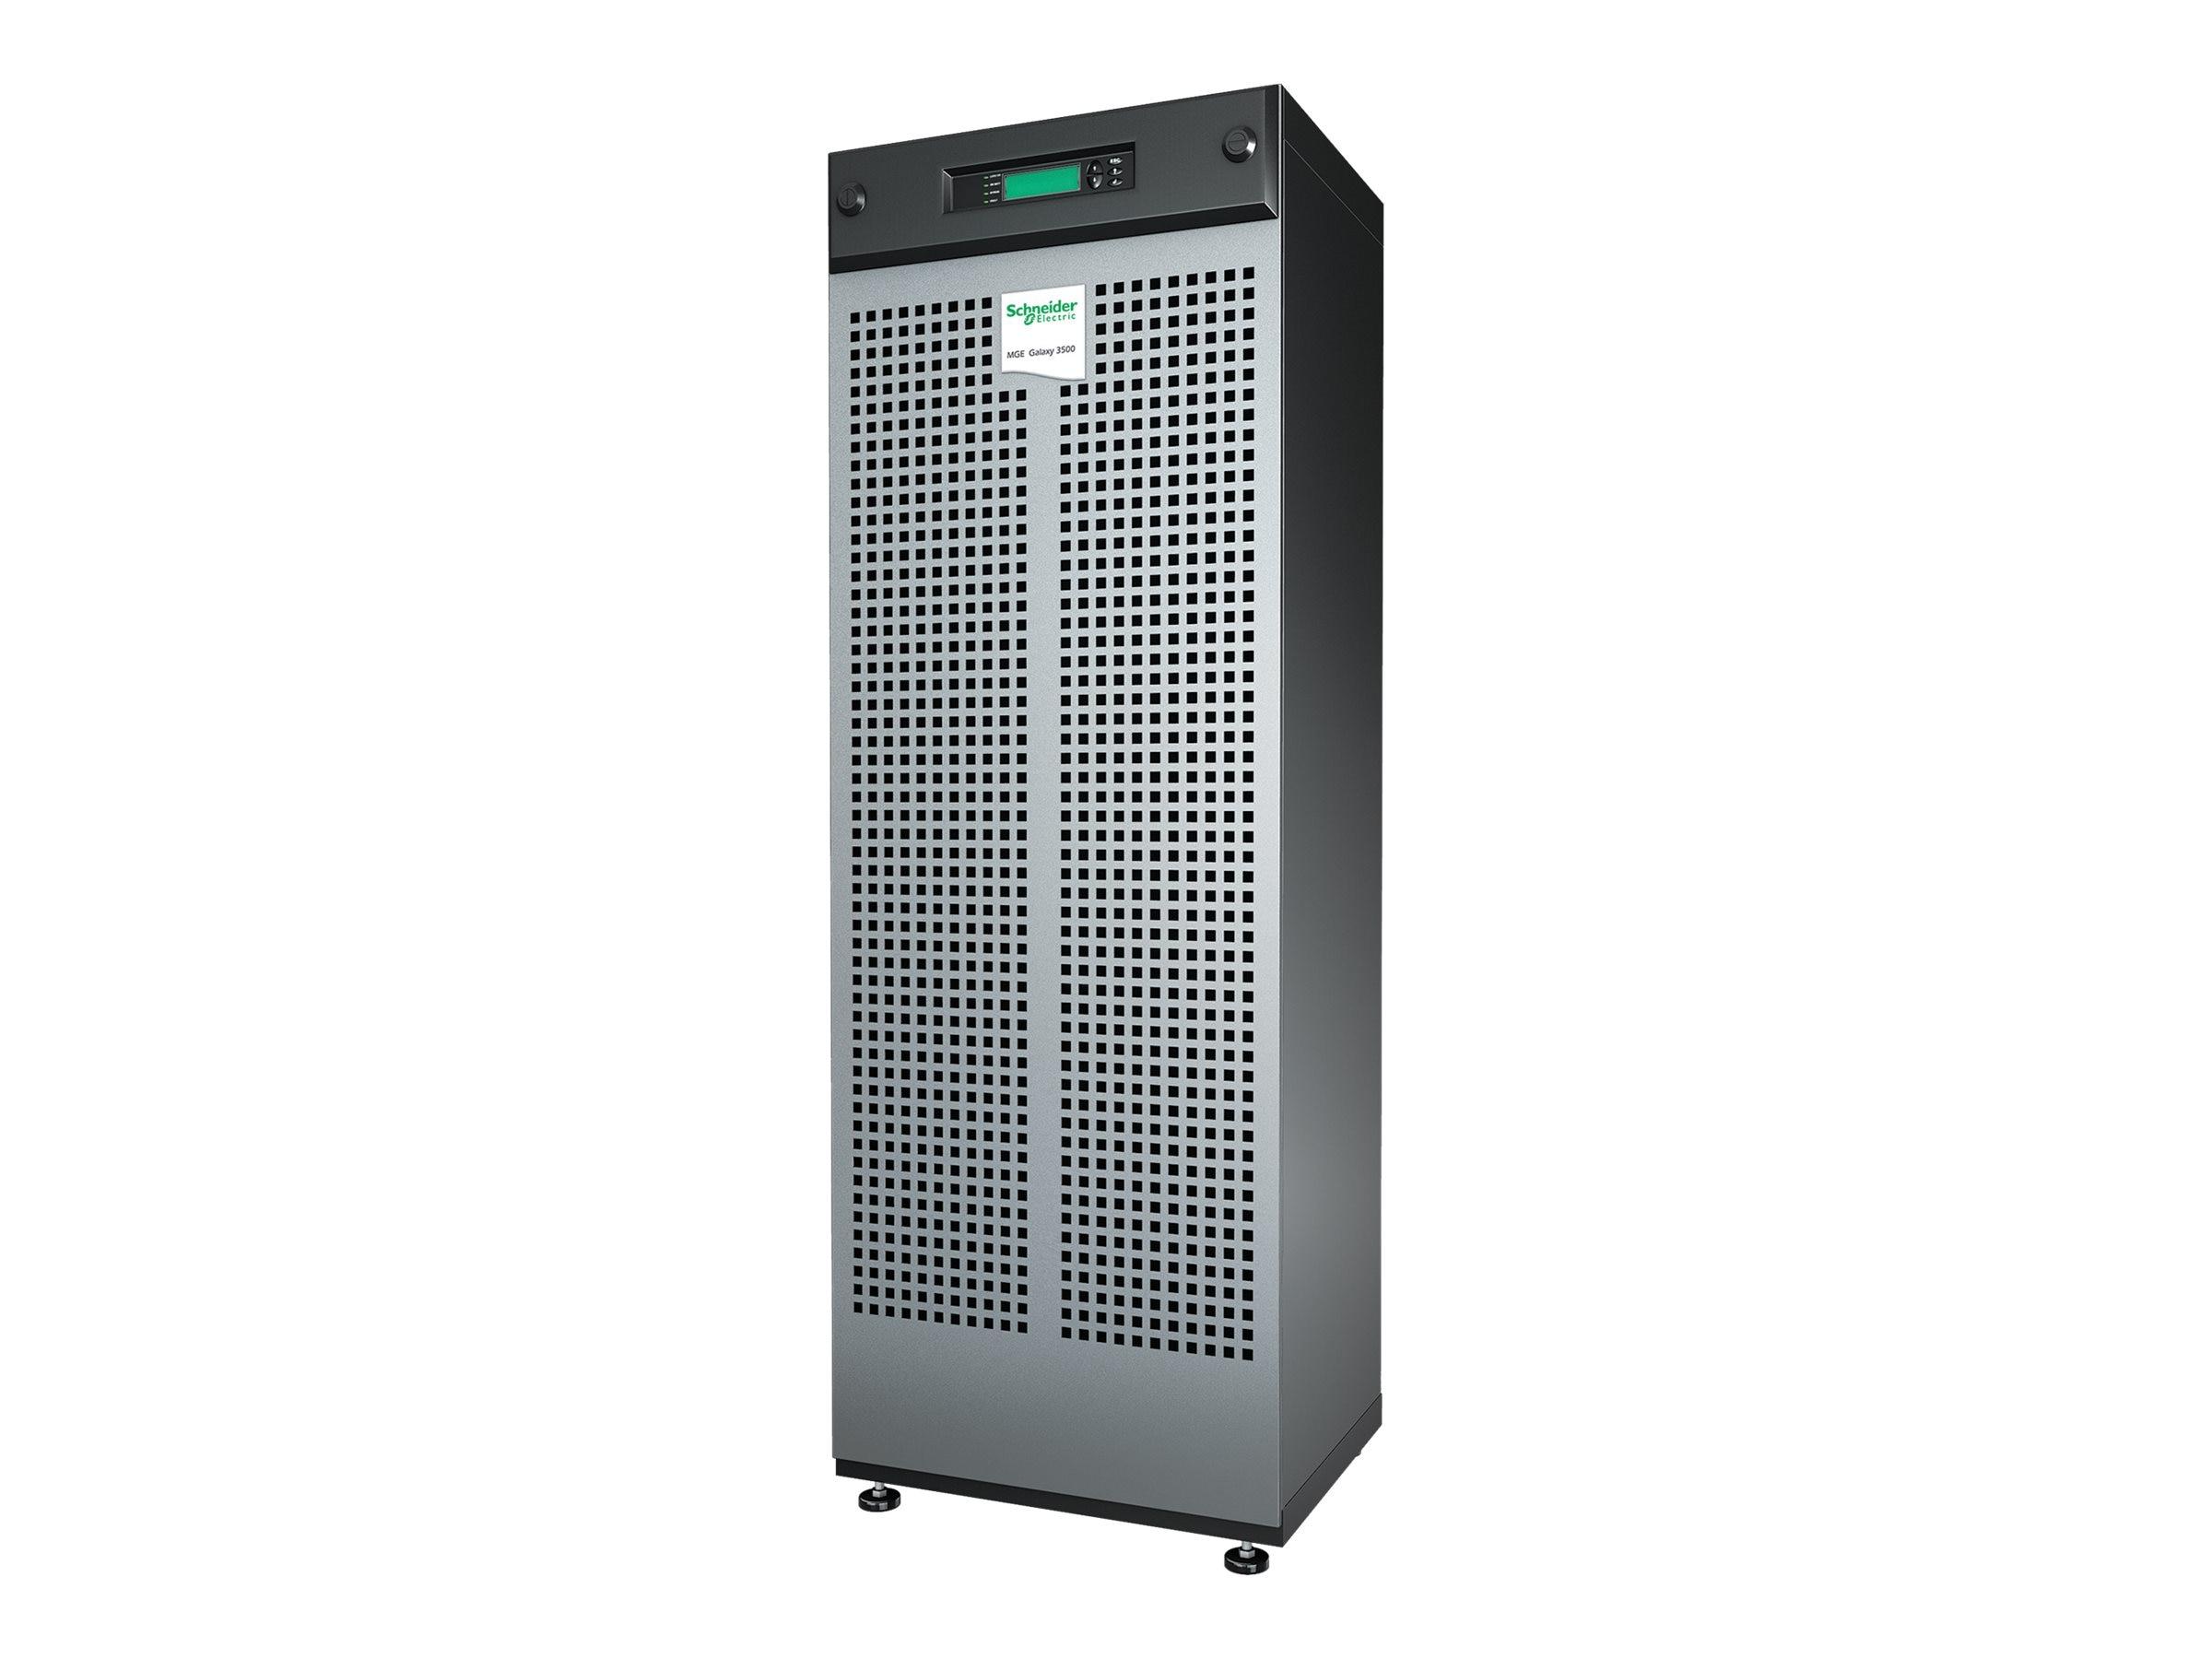 Apc Mge Galaxy 3500 15kva 208v With 4 Battery Modules Start 15 Kva Ups Circuit Diagram G35t15kf4b4s